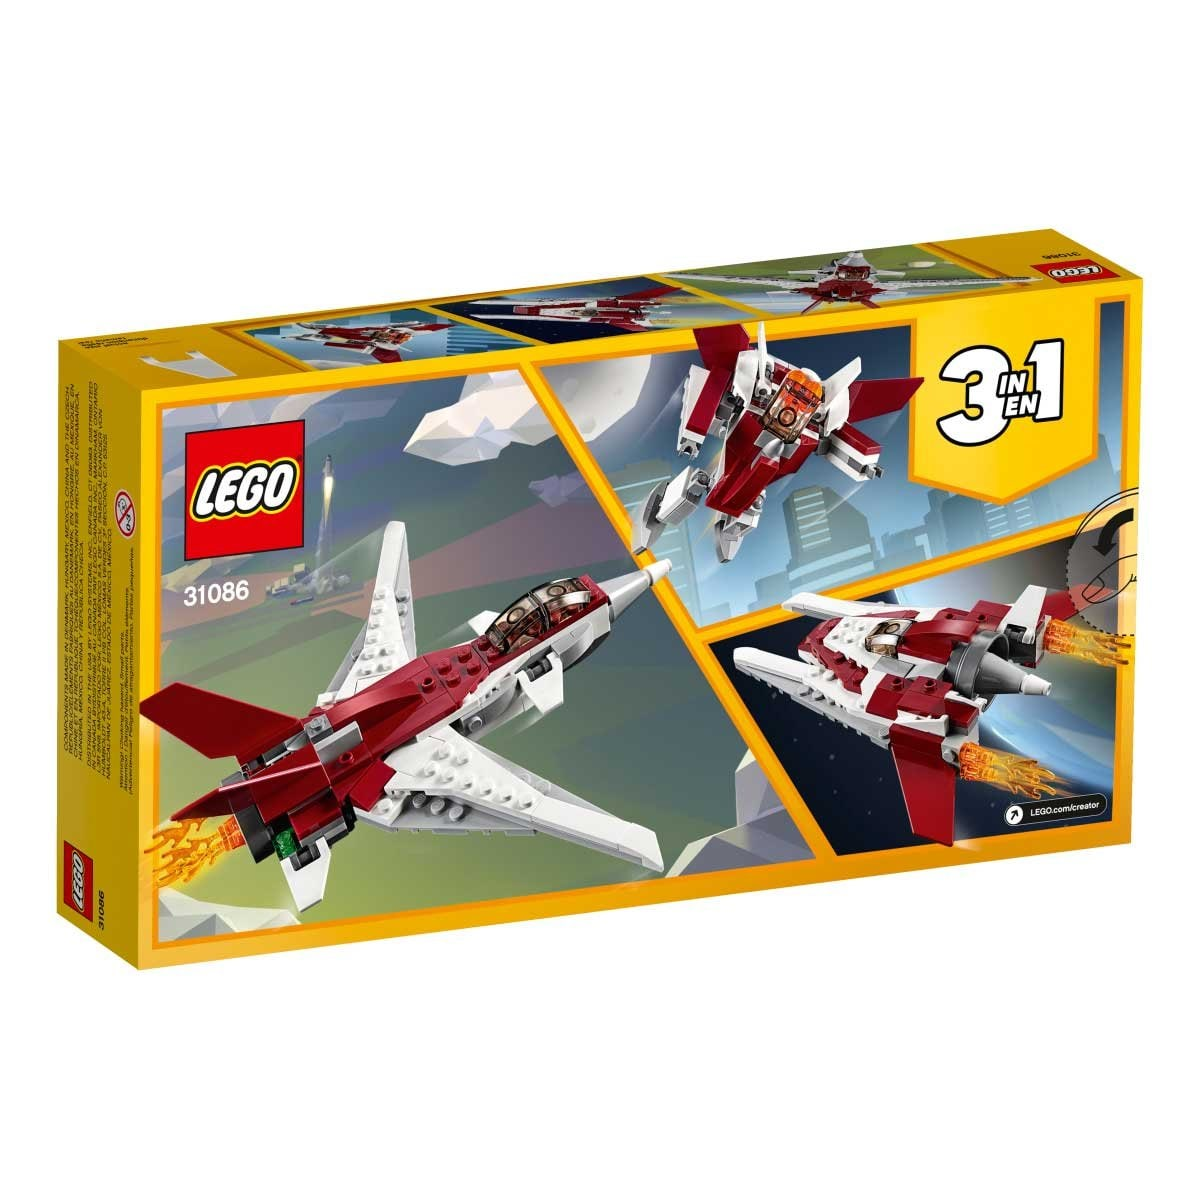 Reactor Futurista Lego